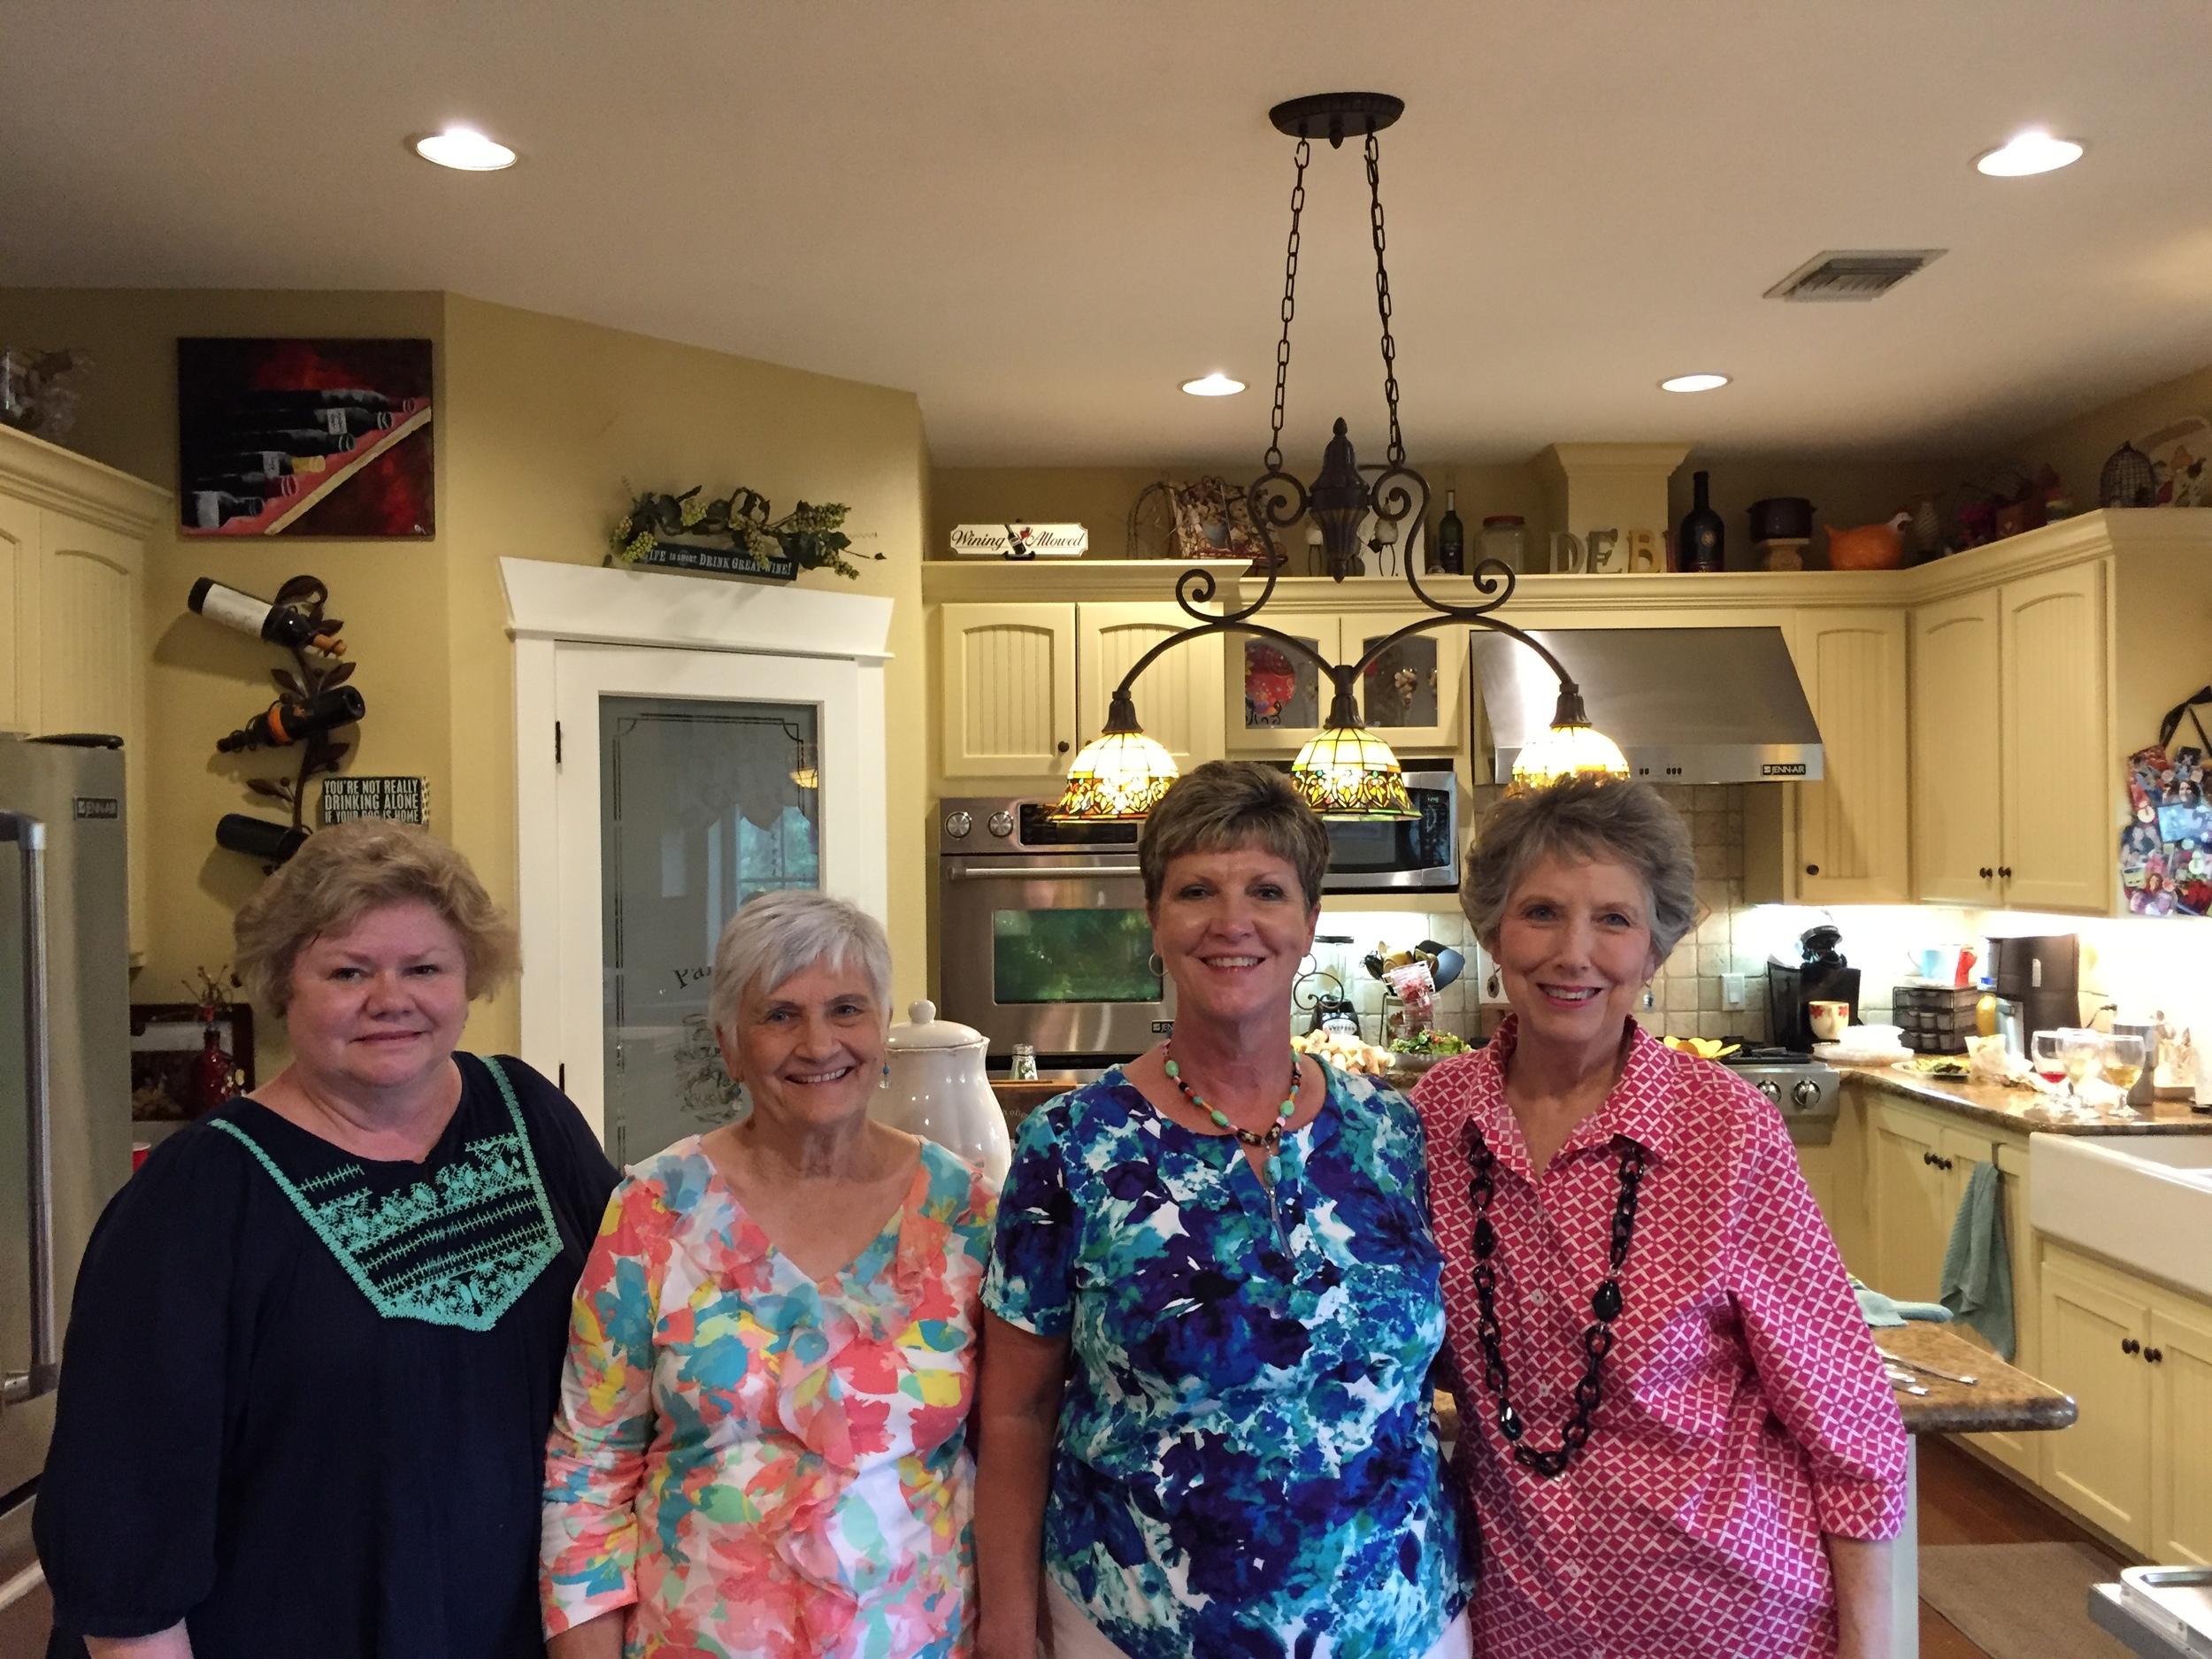 May hostesses - Judy Pendergrass, Carolyn Sander, Debi Meschwitz, Sherry Barkman